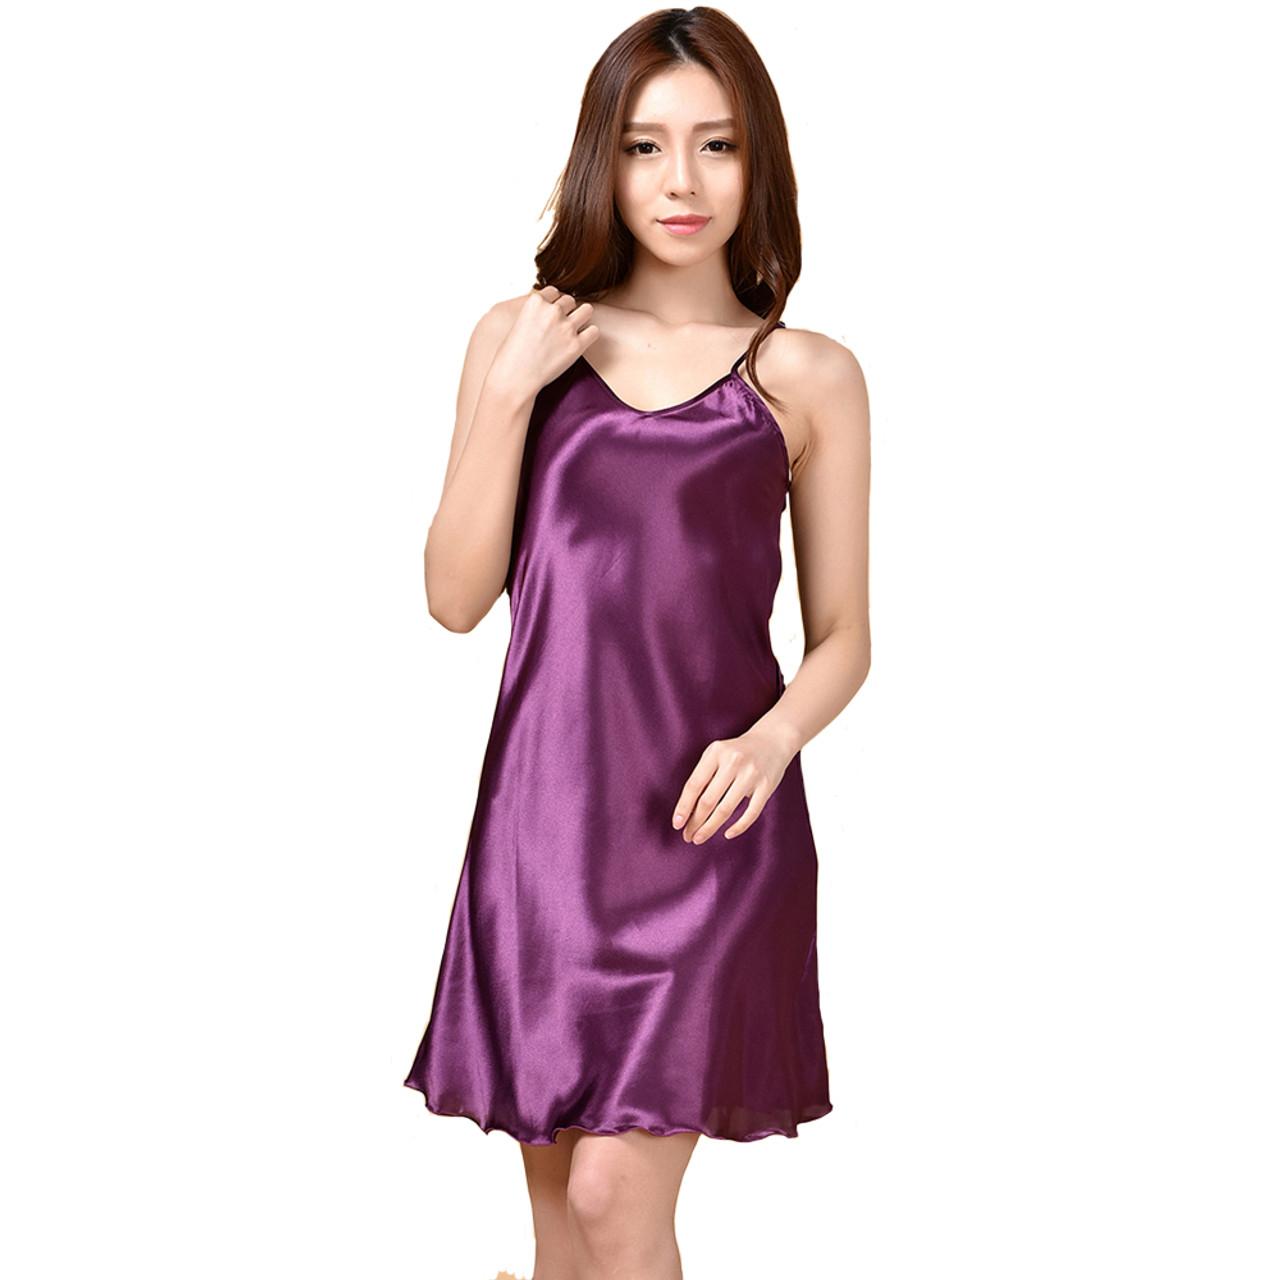 5692dae989 Summer New Women s Sleepwear Female Sexy Spaghetti Strap Nightgown Plus Size  XXXL Rayon Nightdress Short Robe ...